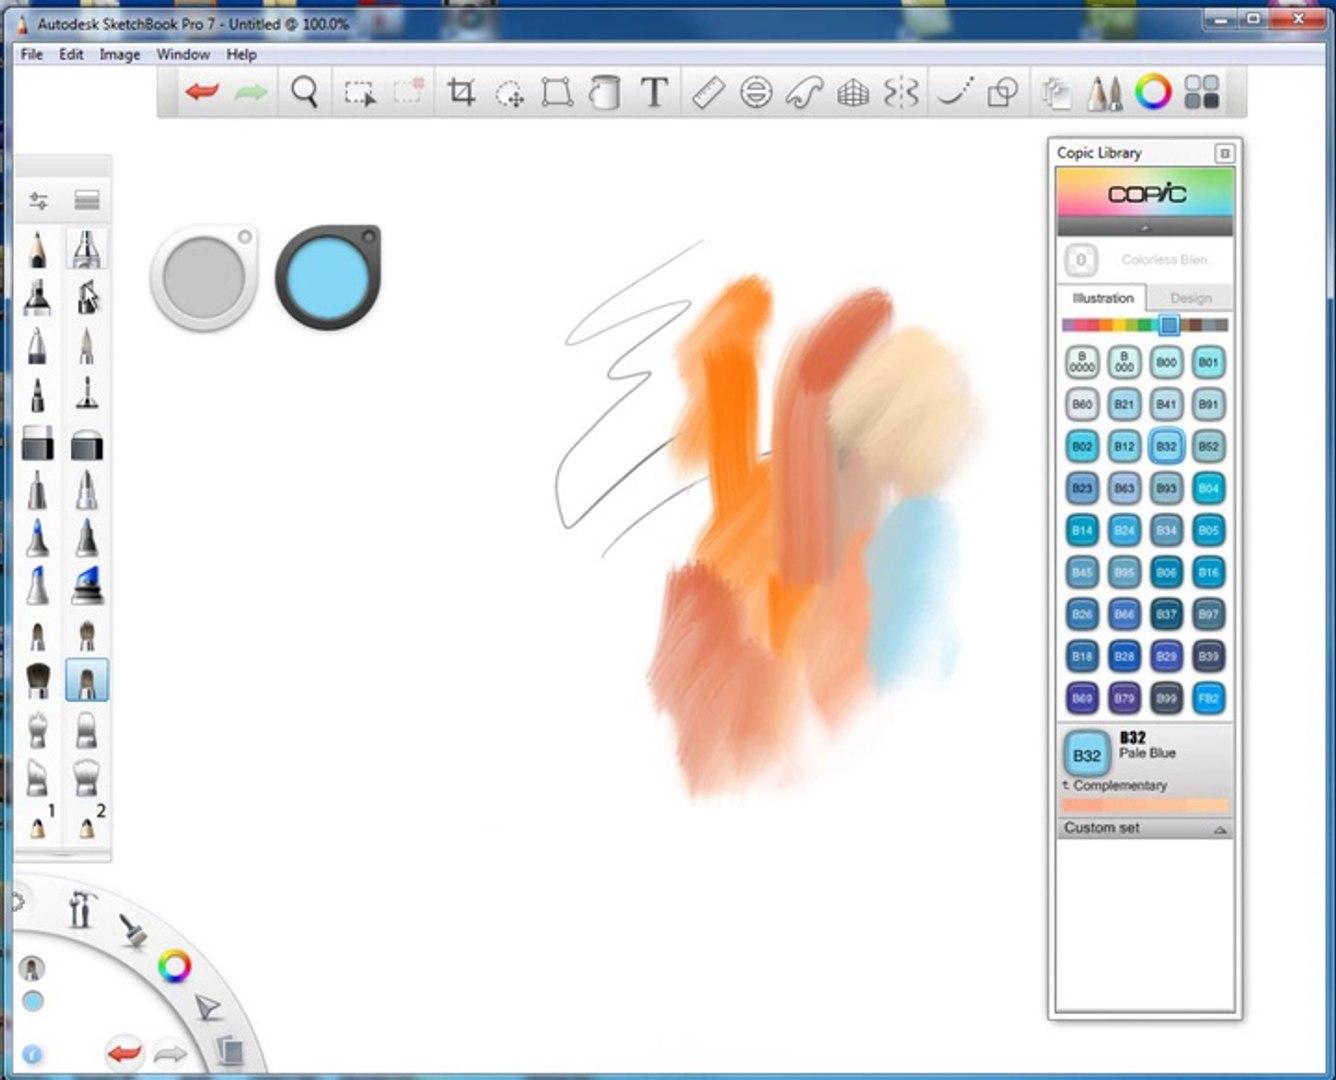 Autodesk Sketchbook Pro 7 Cd Rom